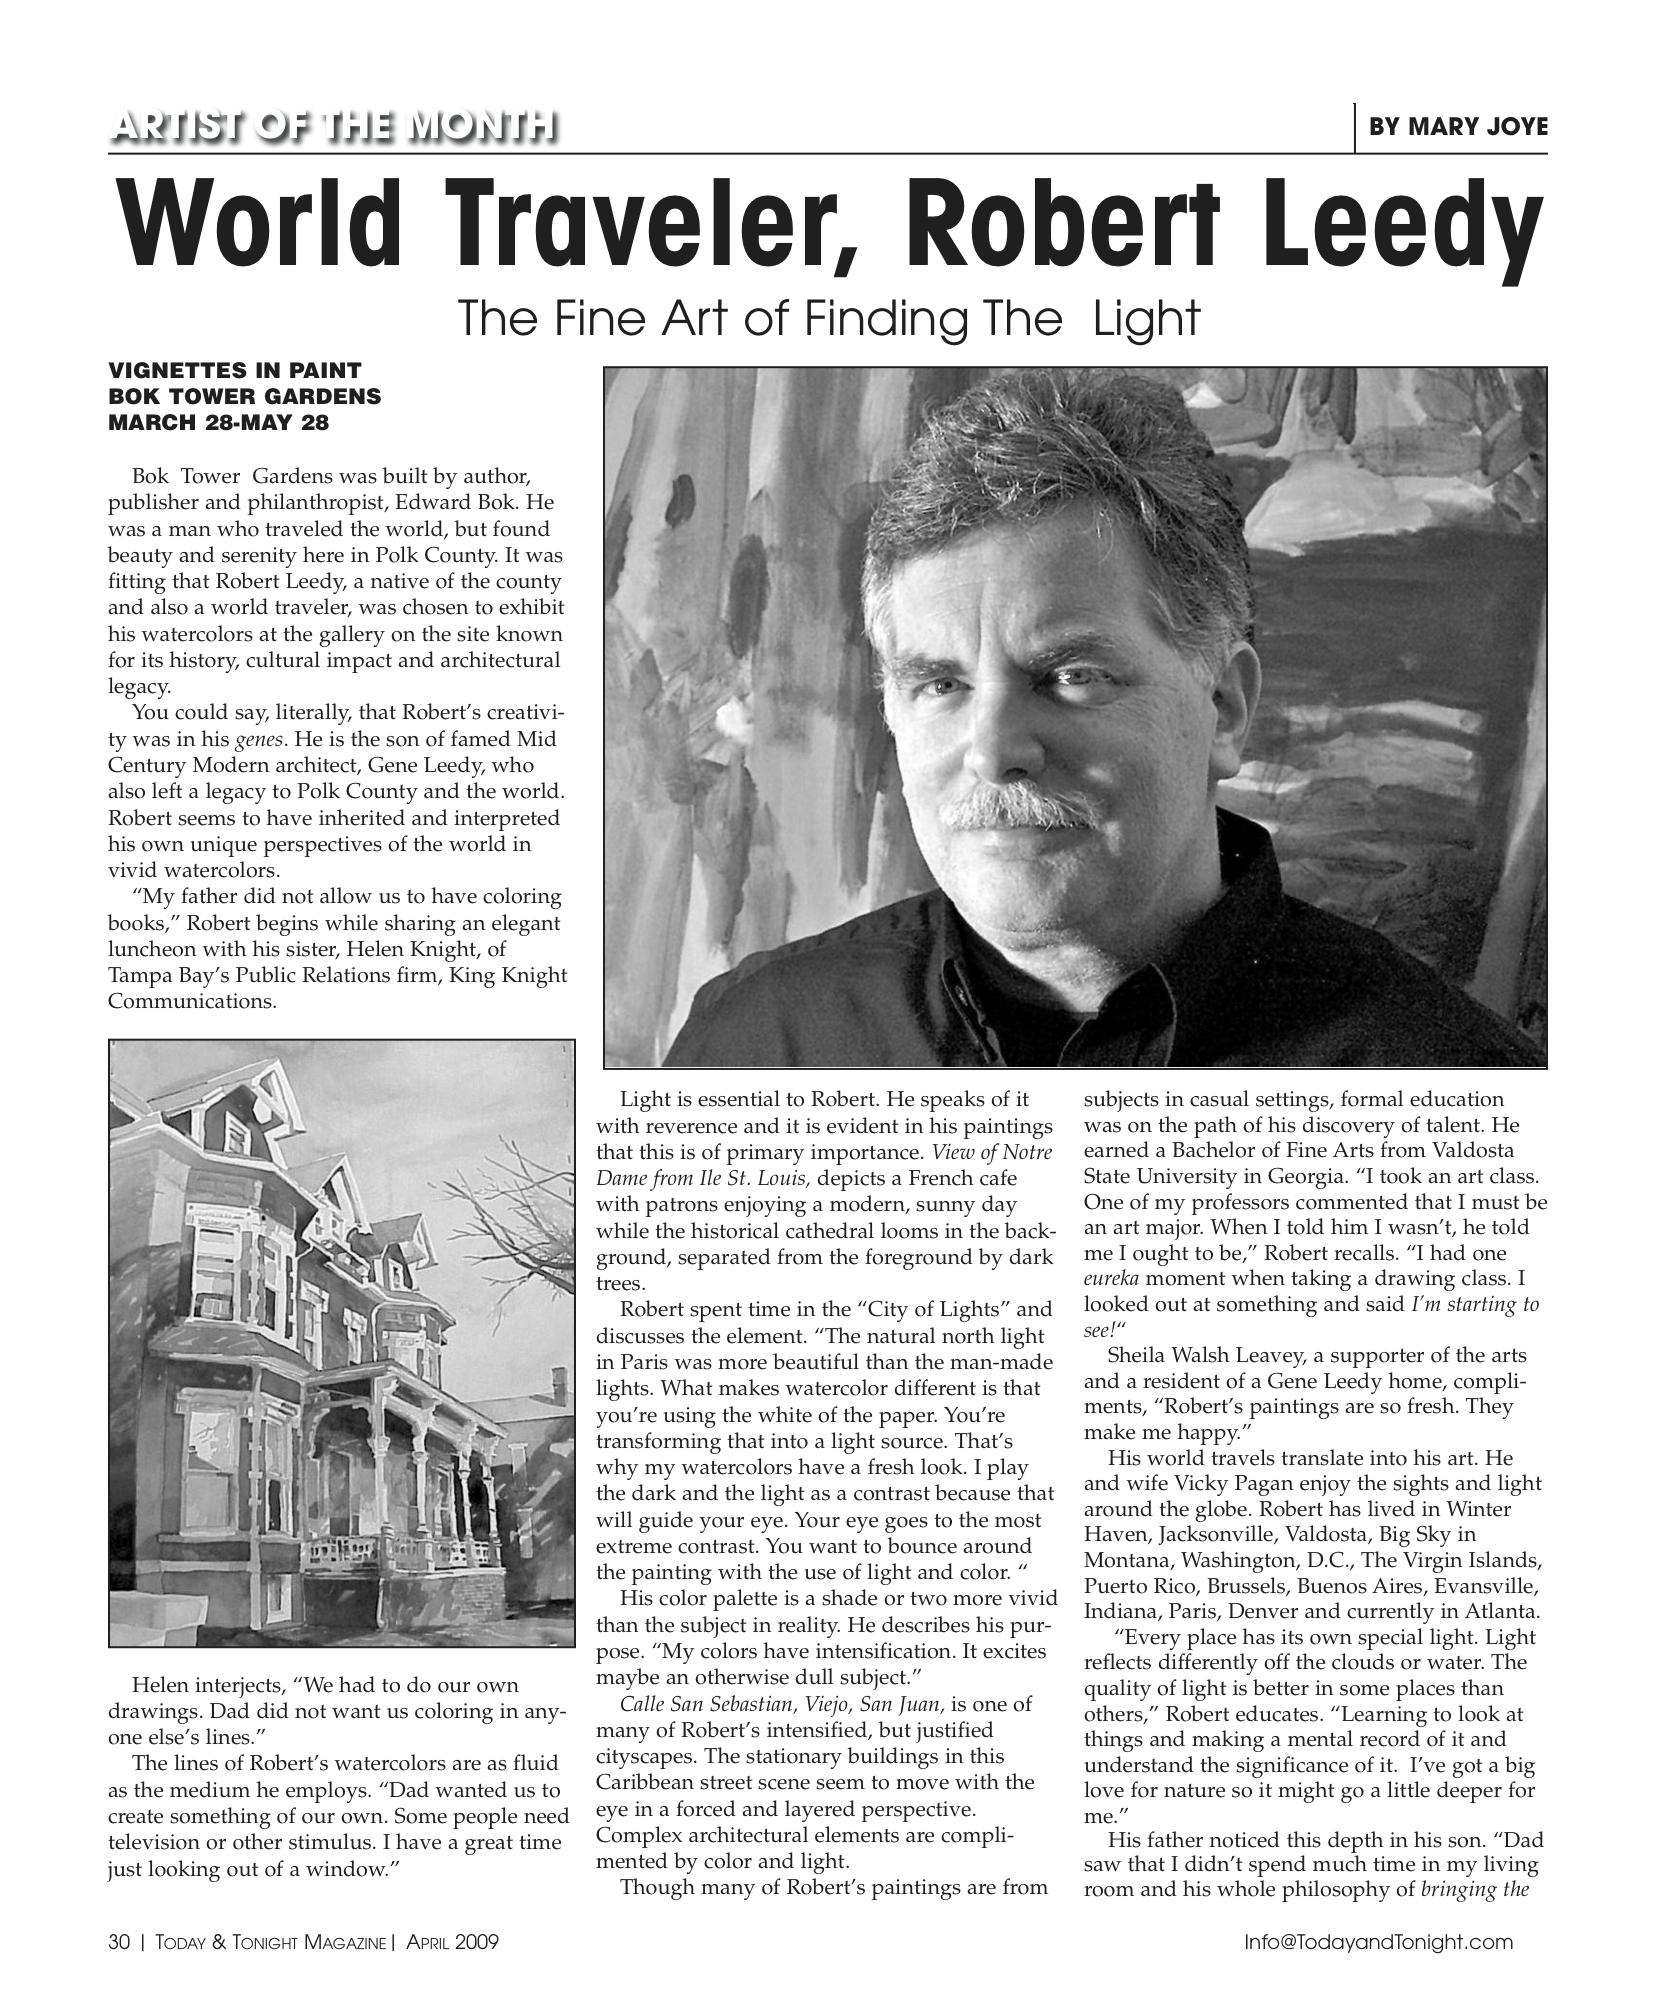 """World Traveler, Robert Leedy: The Fine Art of Finding The Light"""